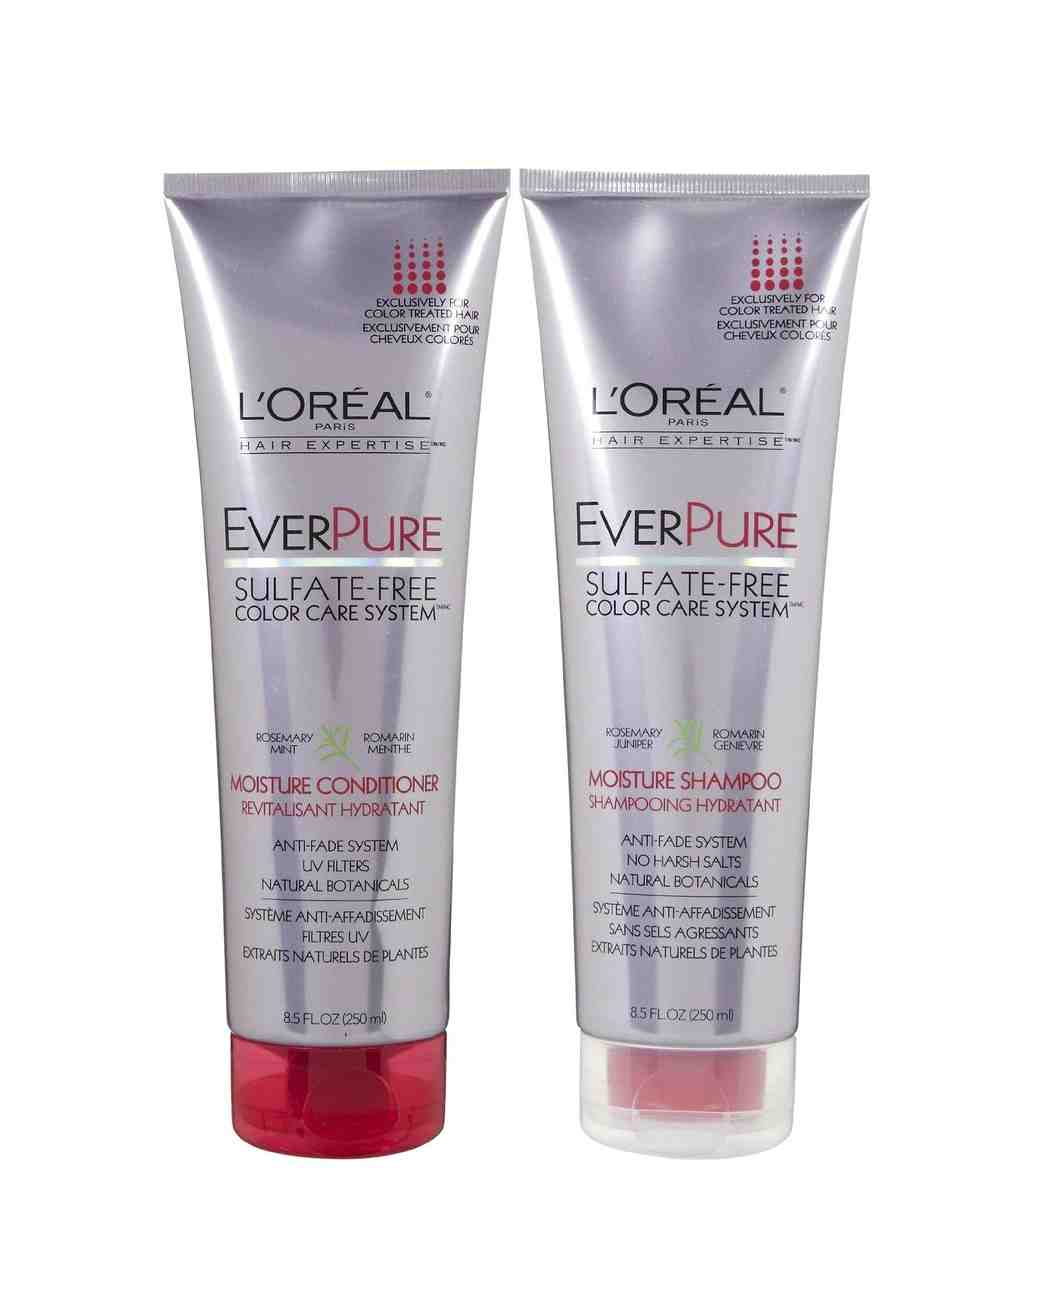 big-day-beauty-awards-loreal-everpure-shampoo-and-conditioner-0216.jpg